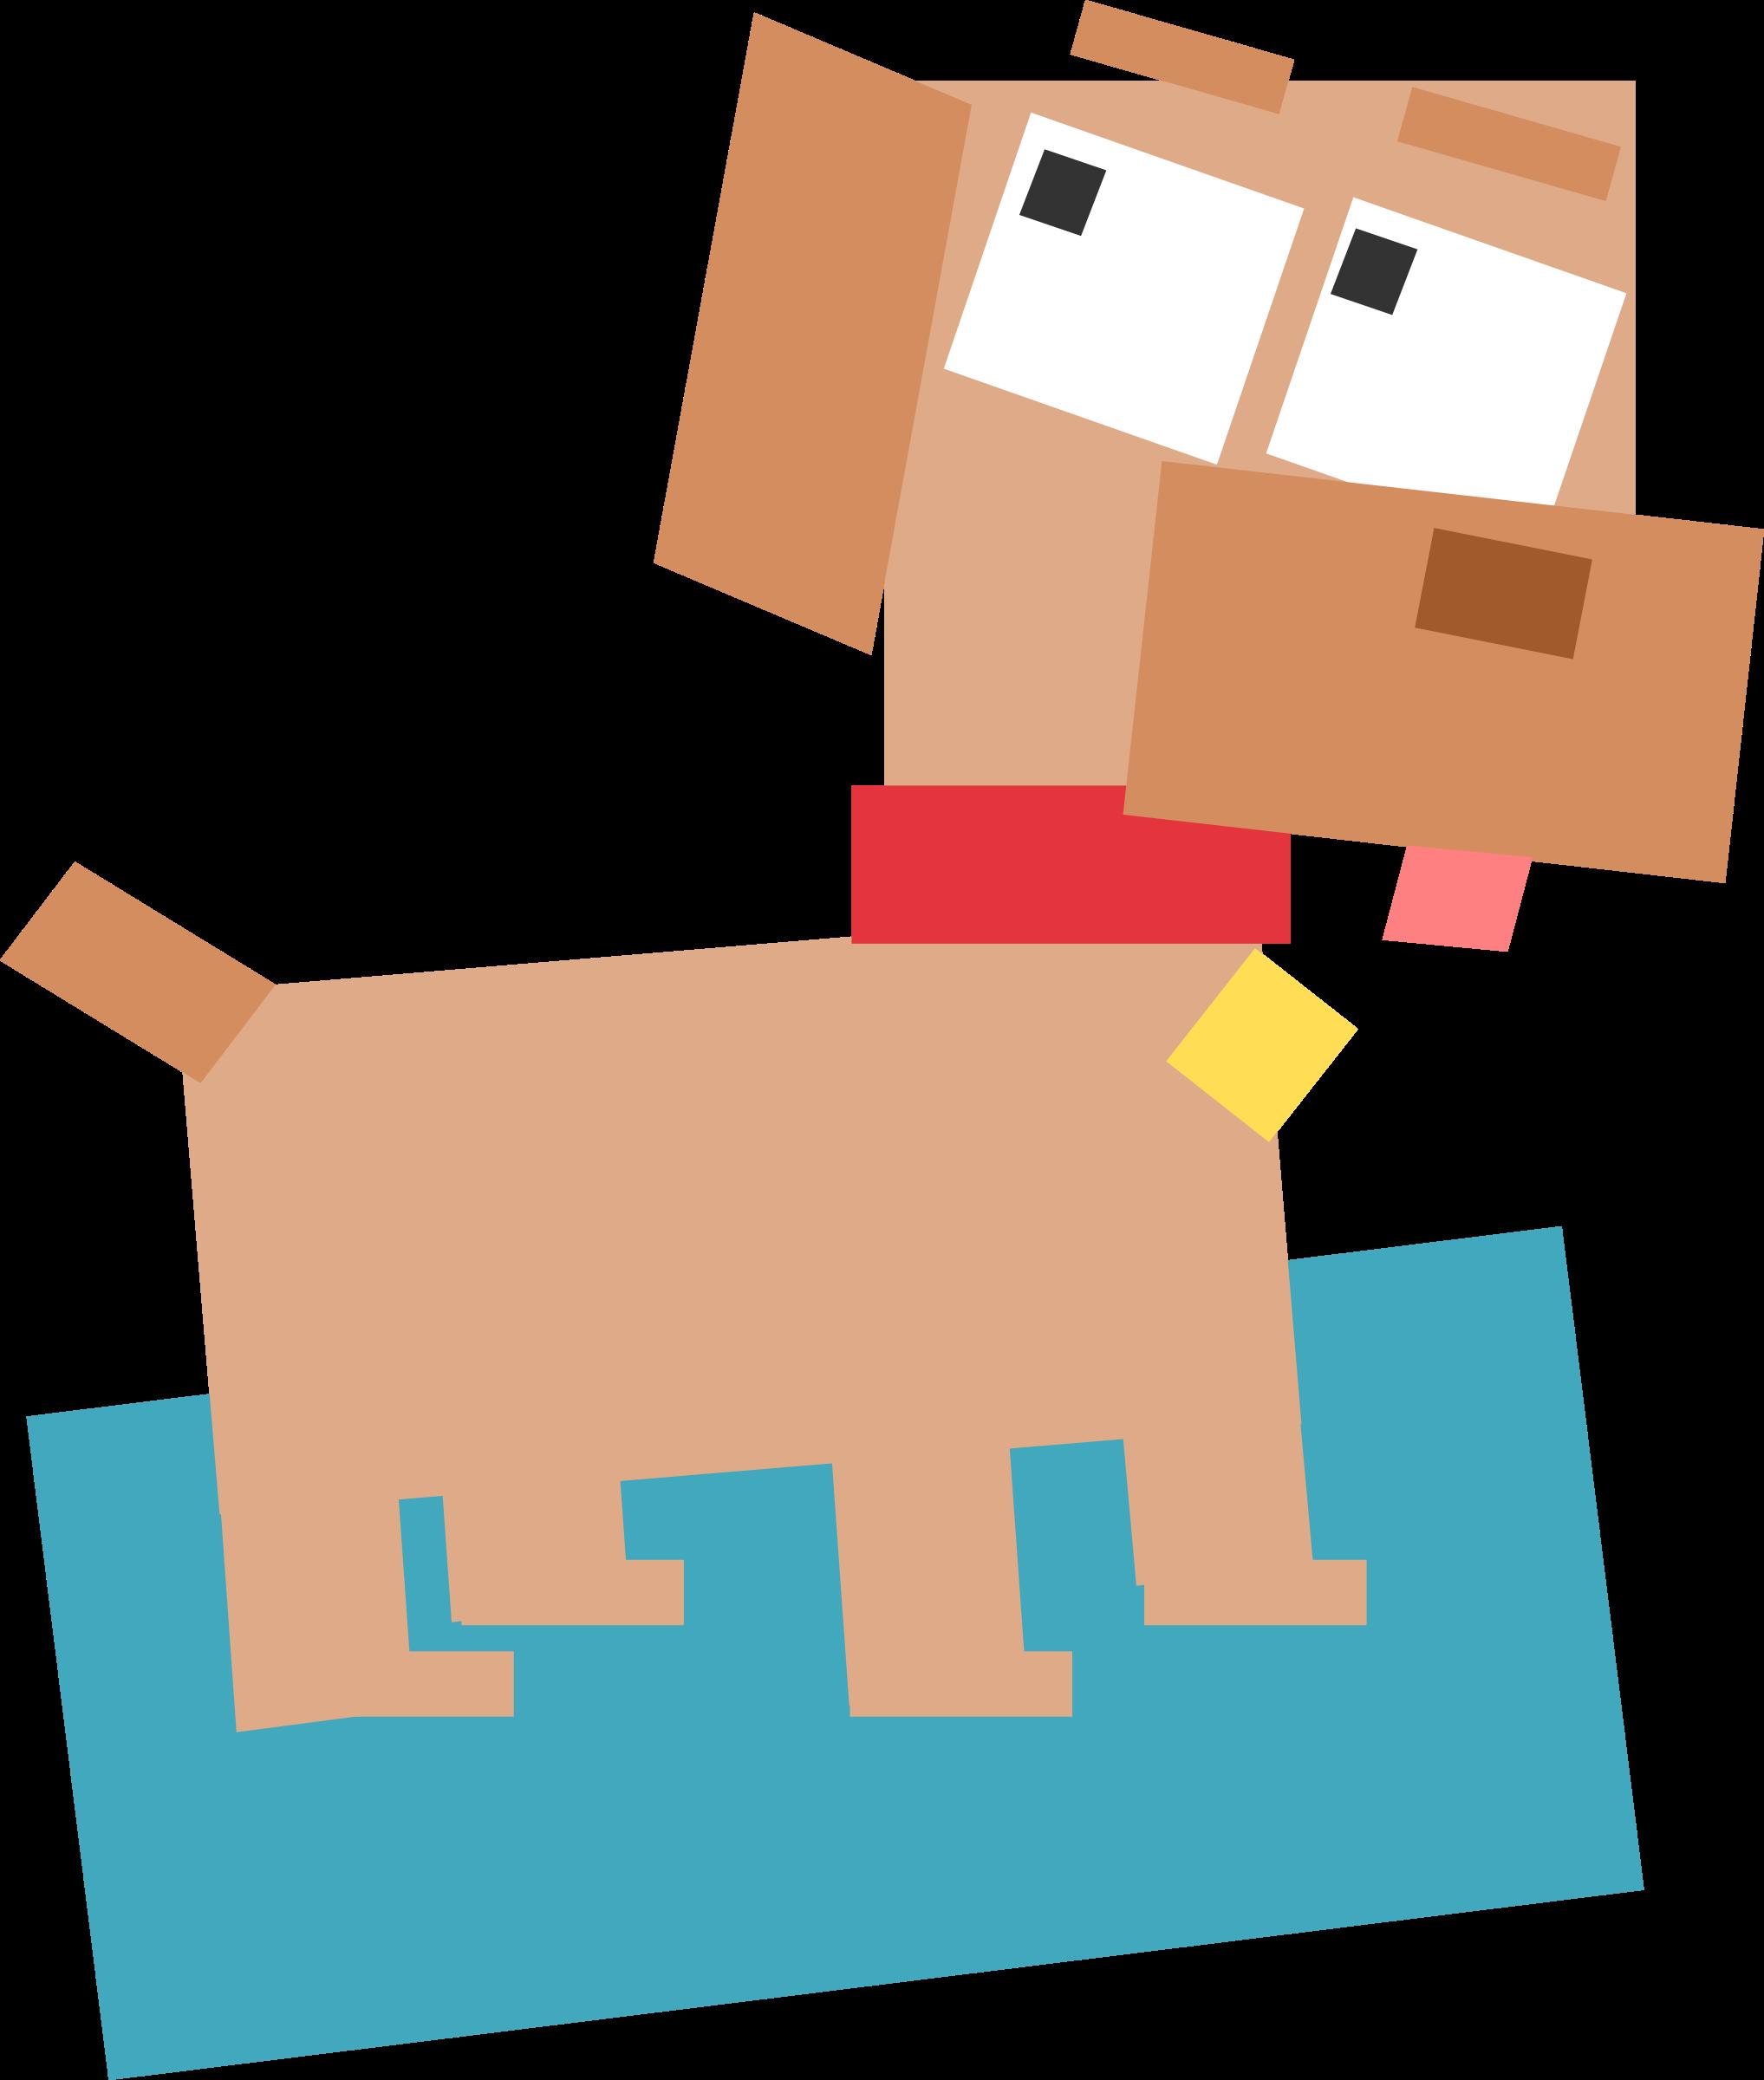 Square clipart cartoon Square Clipart Square animal dog